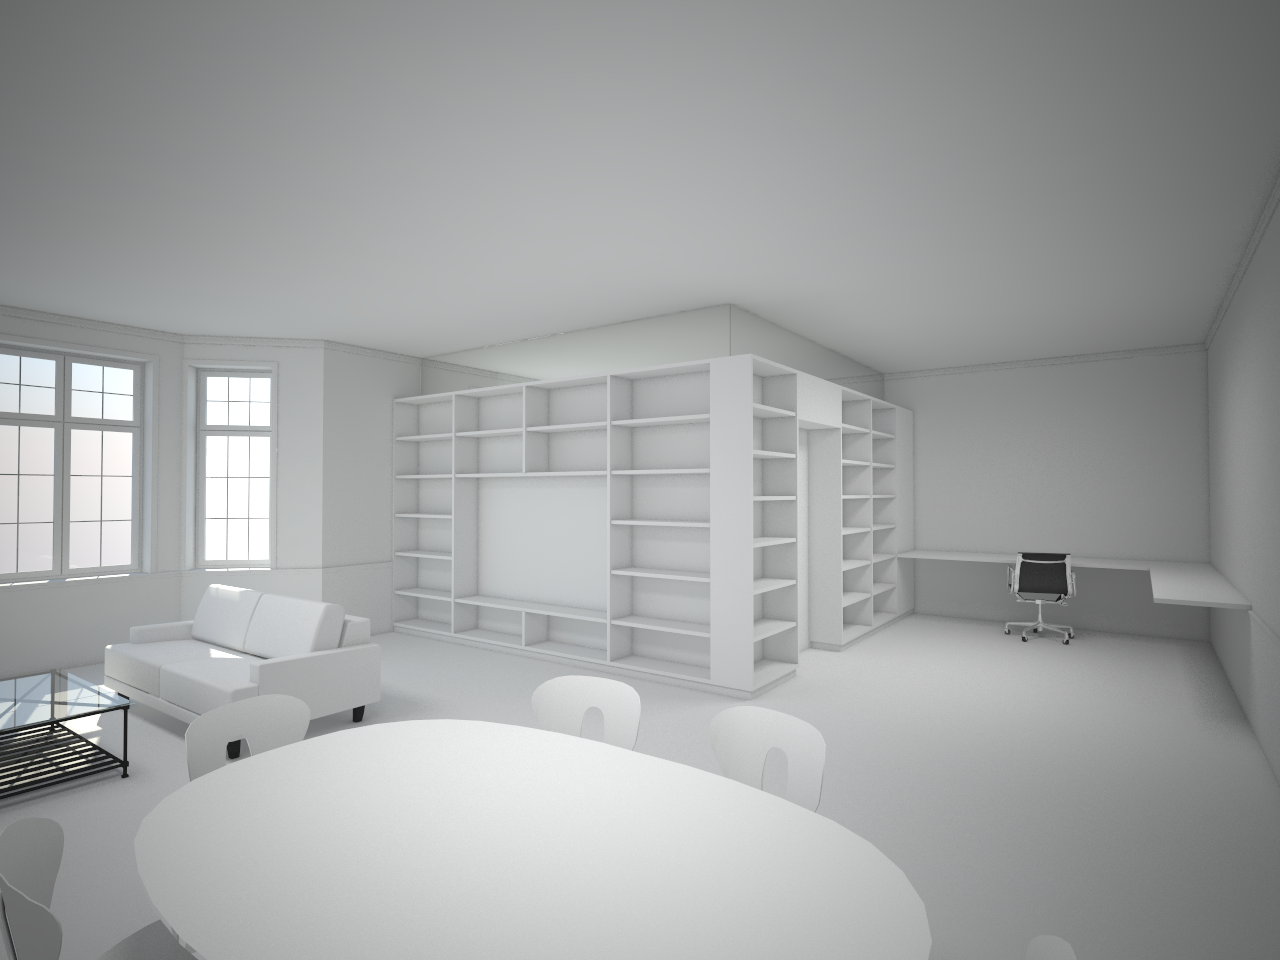 Apartment - Claymodel by sirethomas